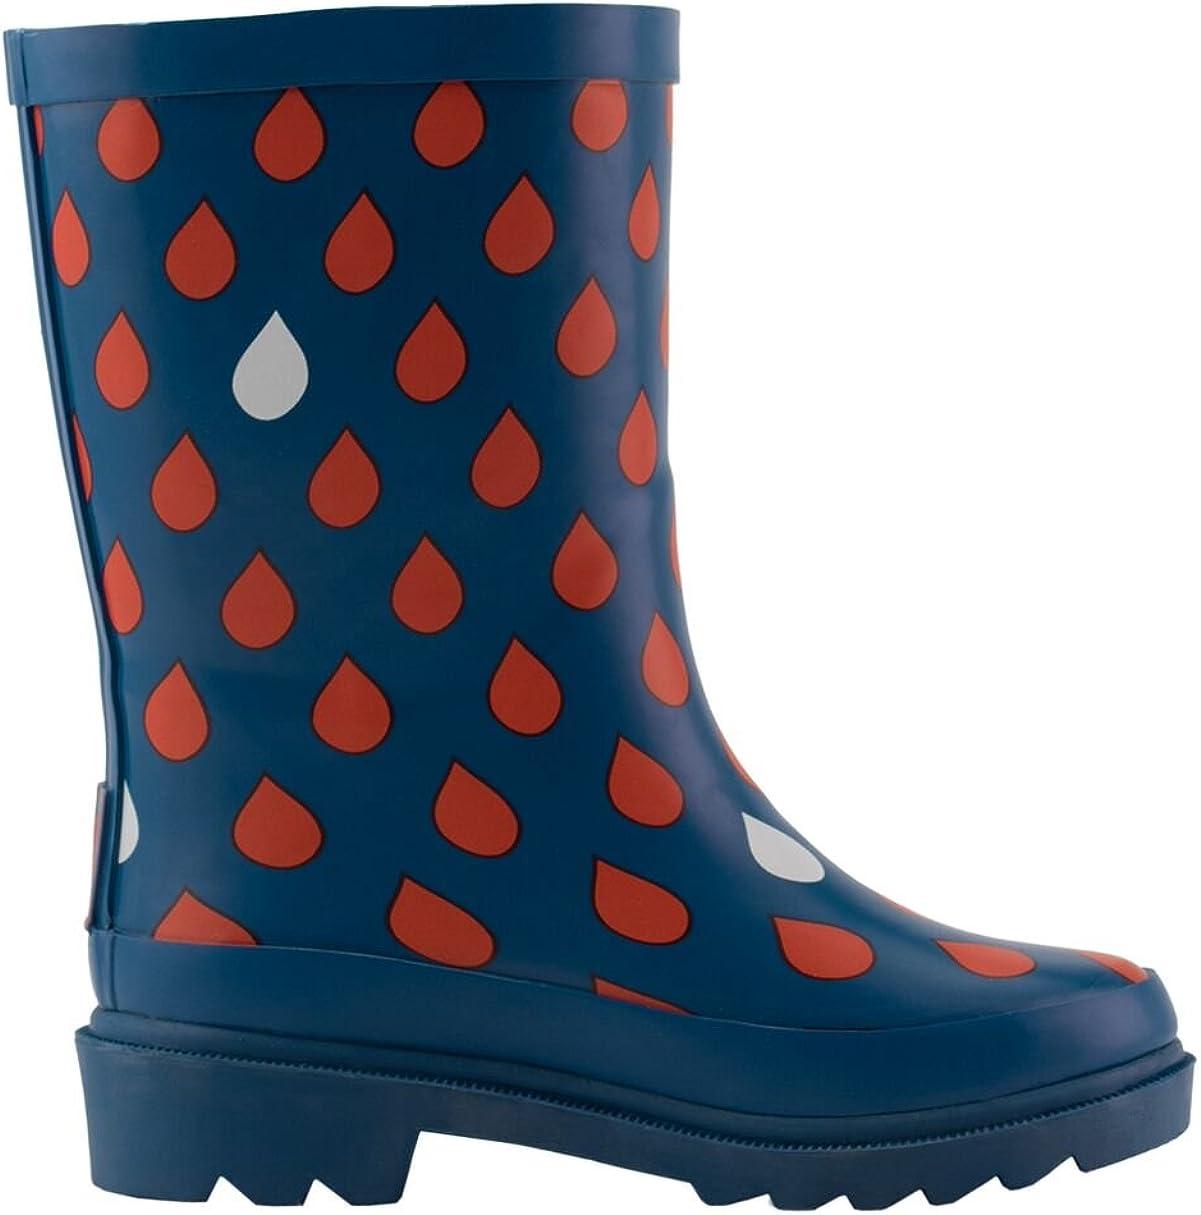 OAKI Kids Rubber Rain Boots with Buckle